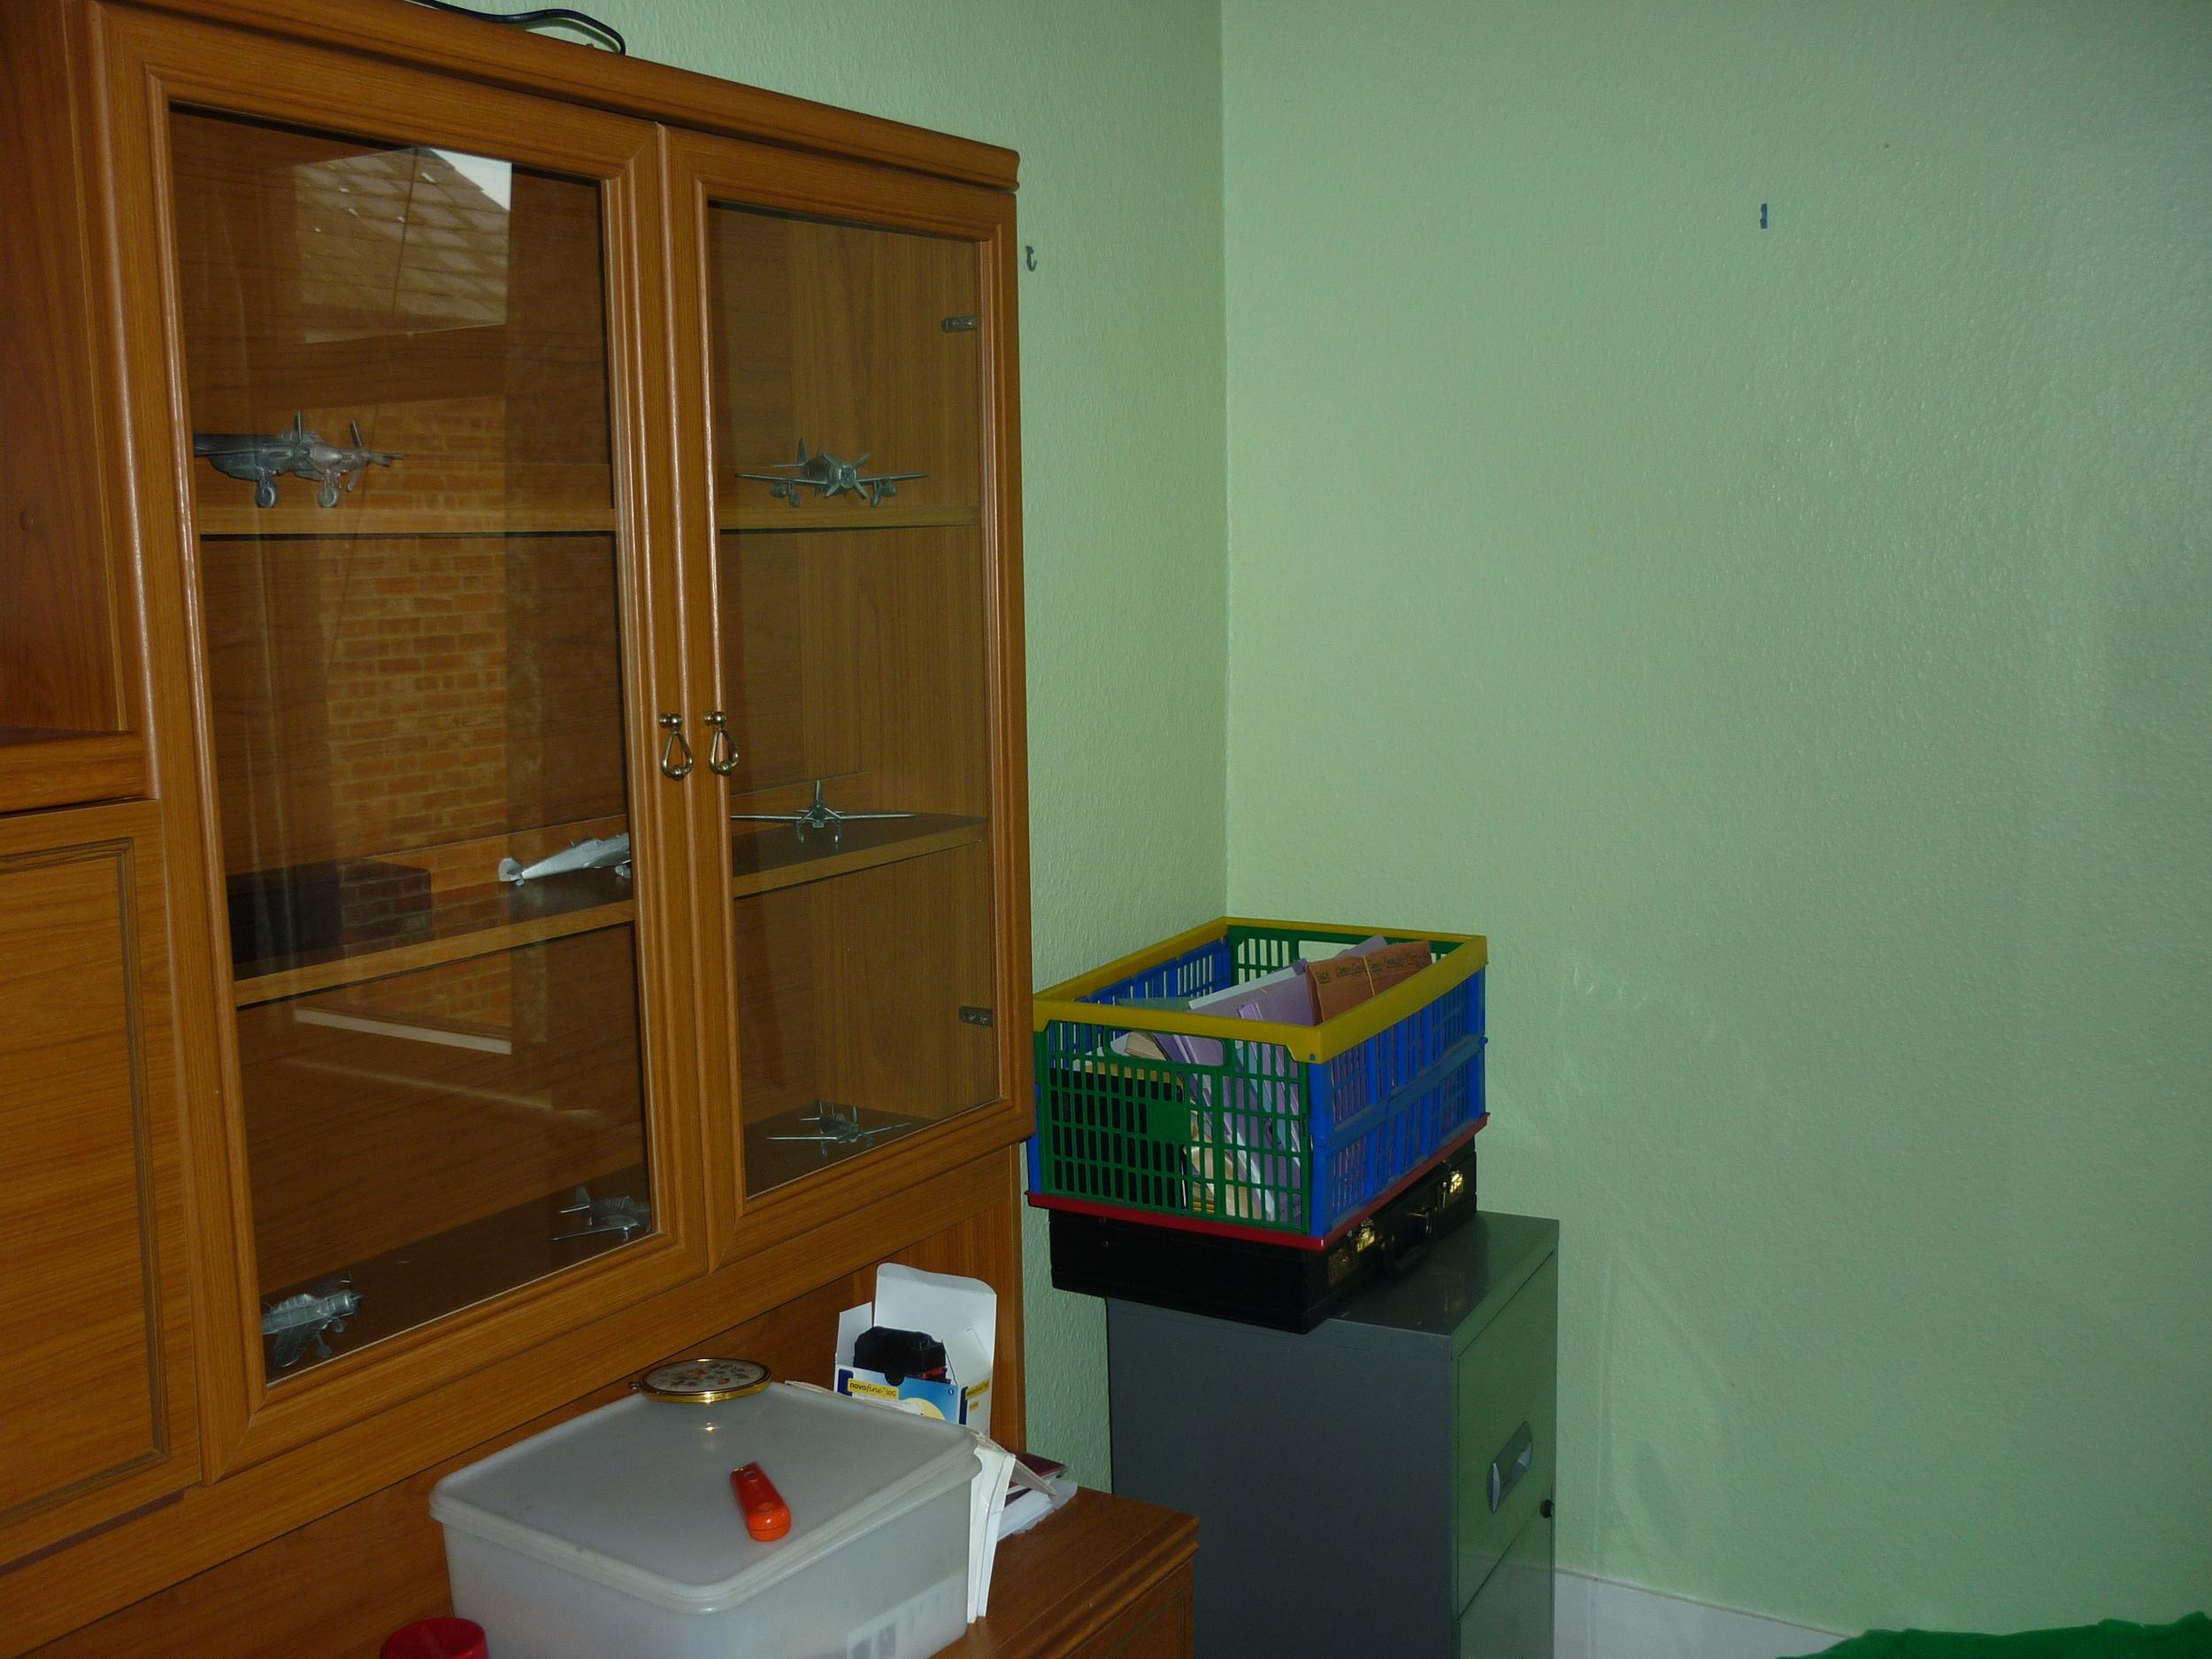 old-bathroom.JPG